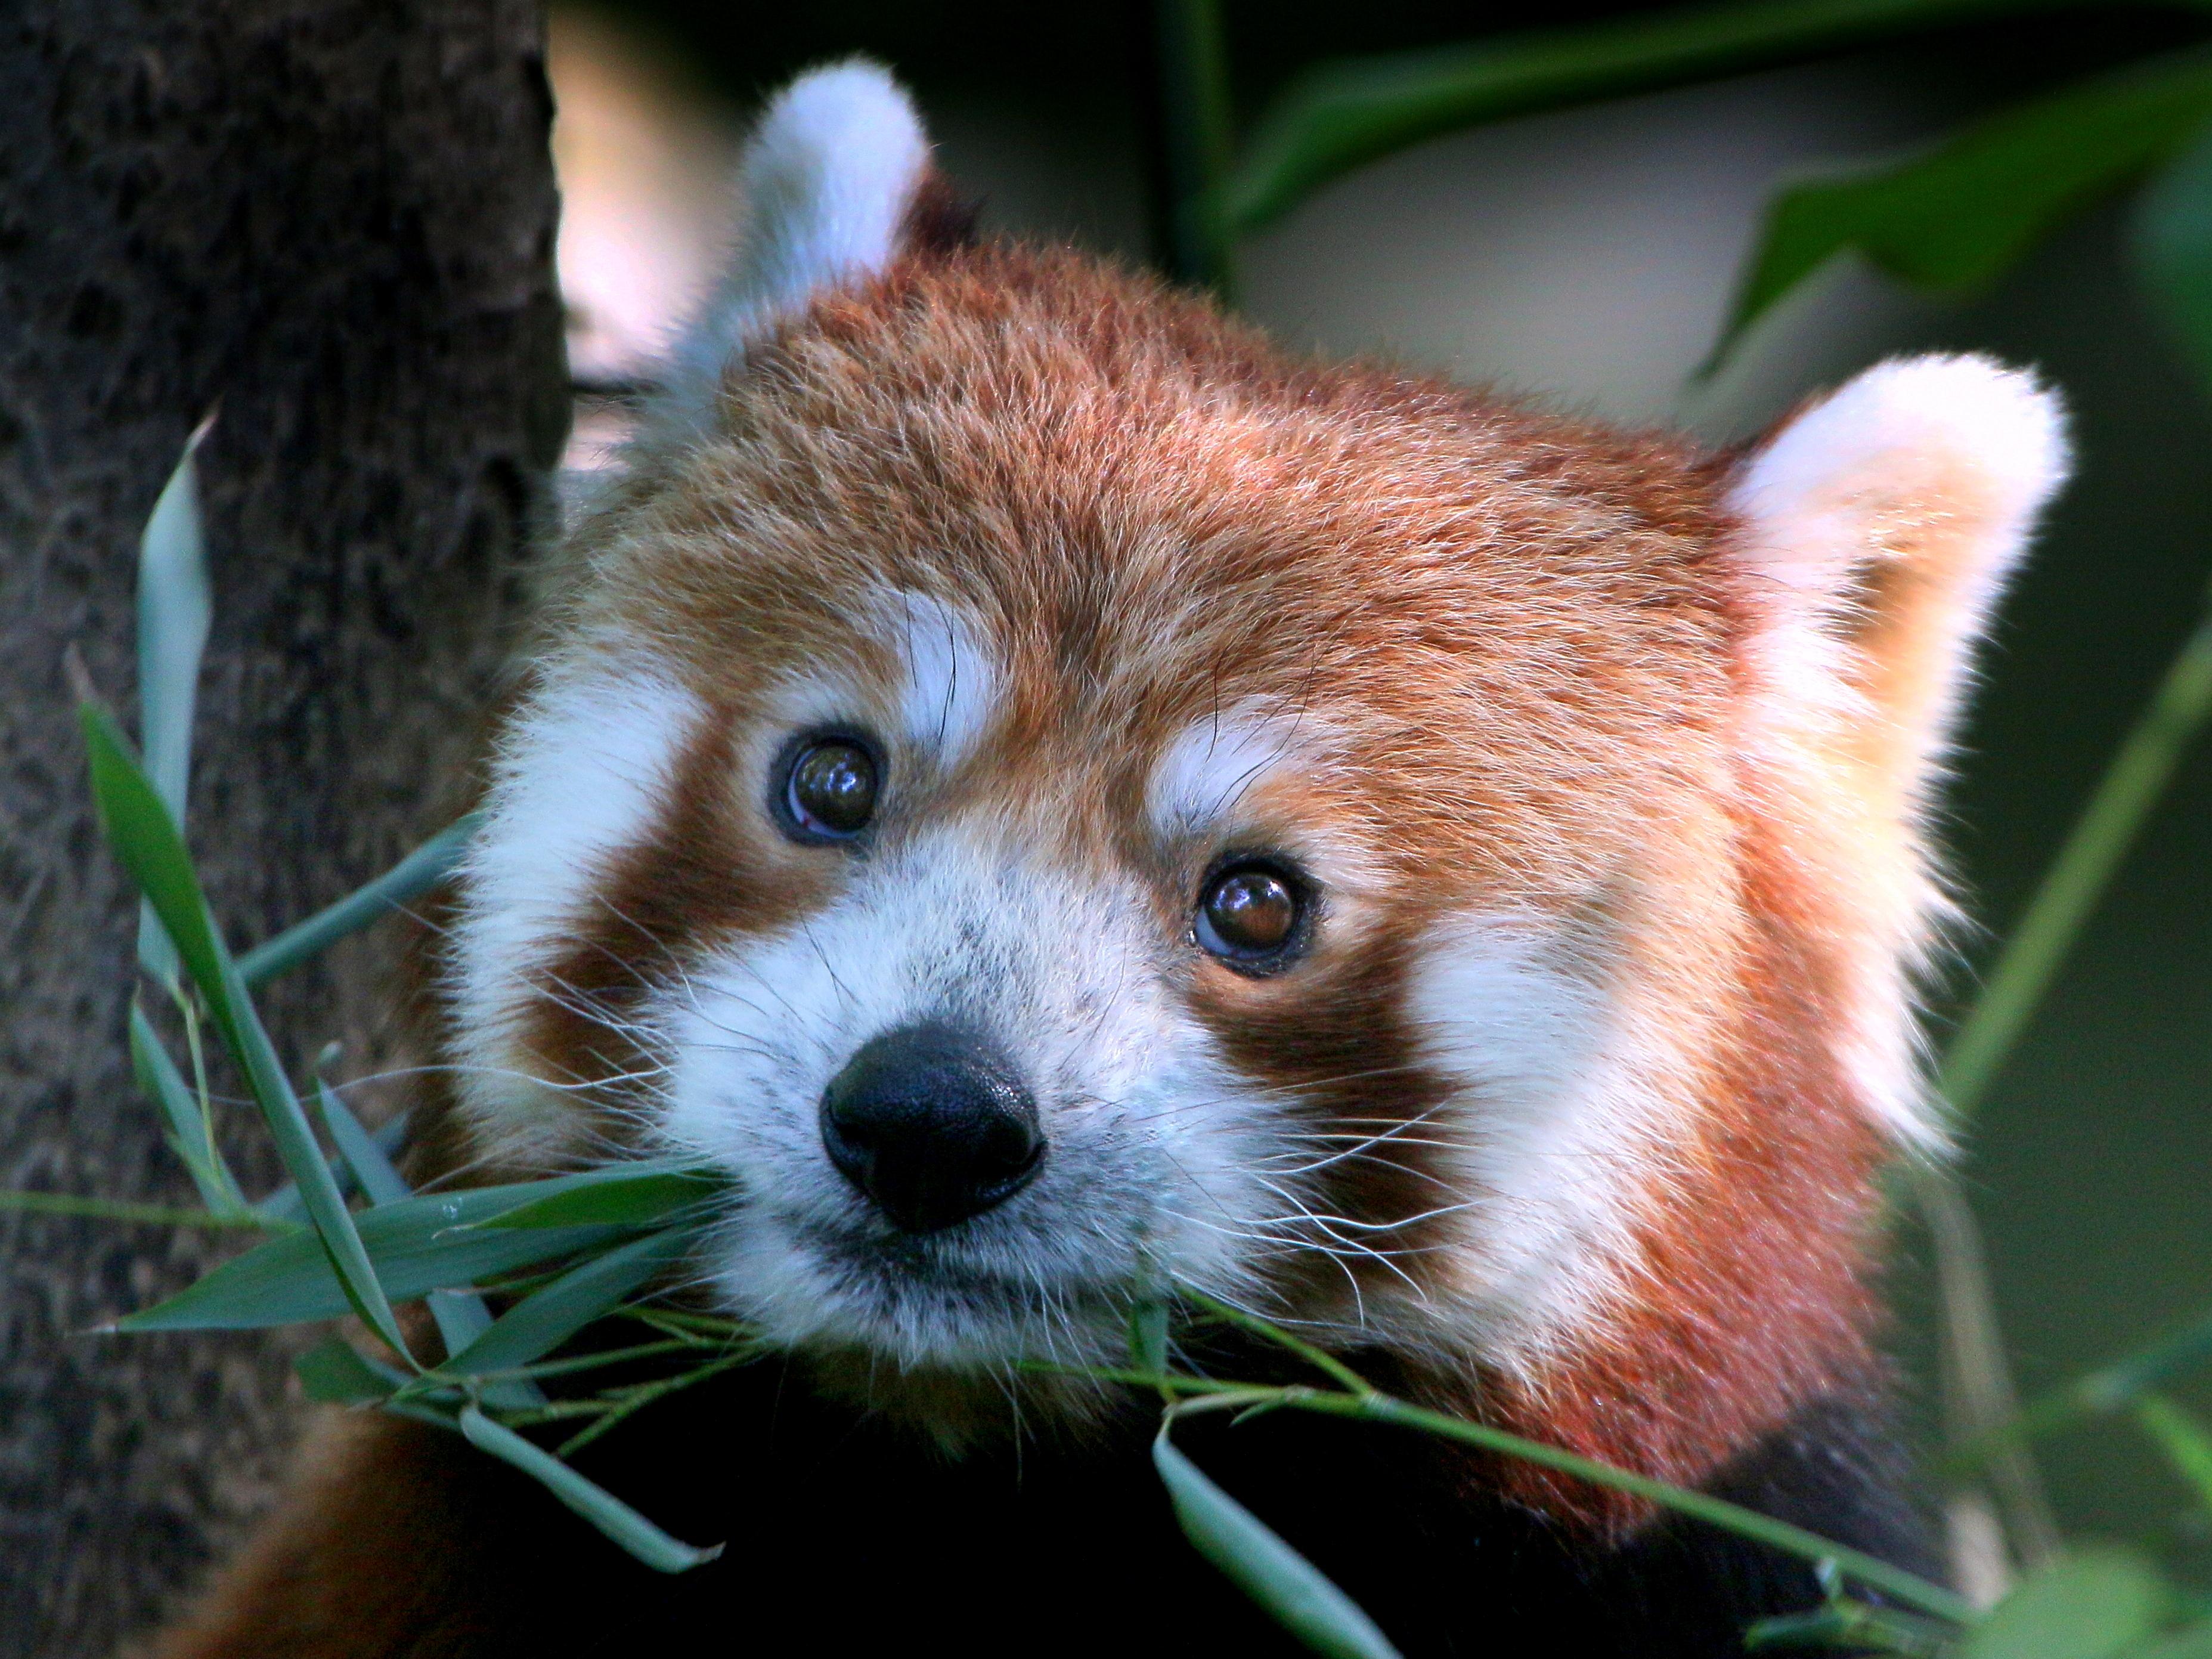 techcrunch.com - Frederic Lardinois - Firefox is now a better iPad browser